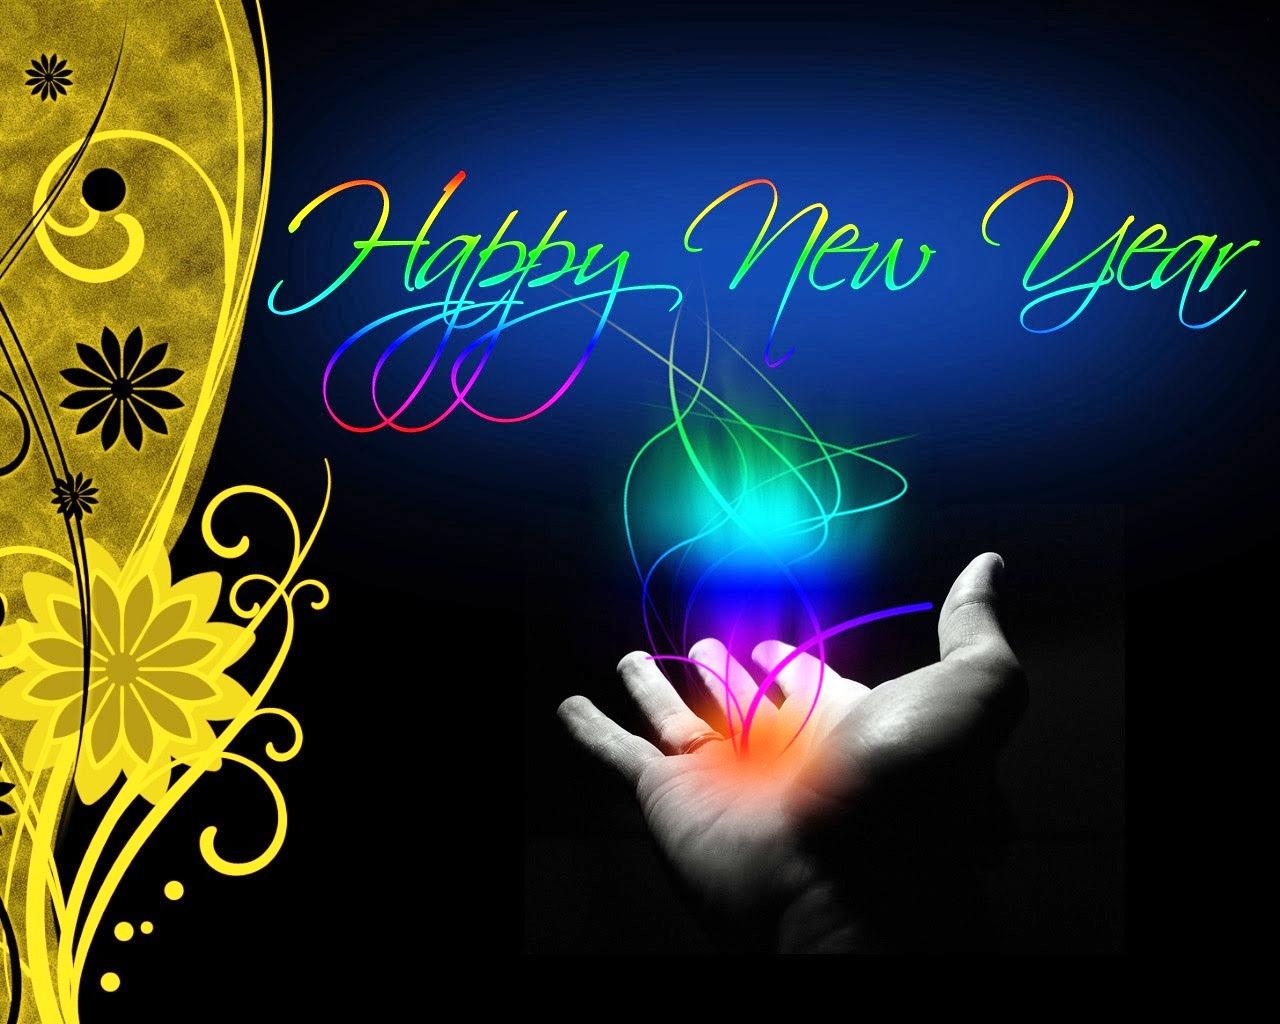 Happy New Year 2018 Greeting Download Hd Desktop Wallpapers 1280x1024